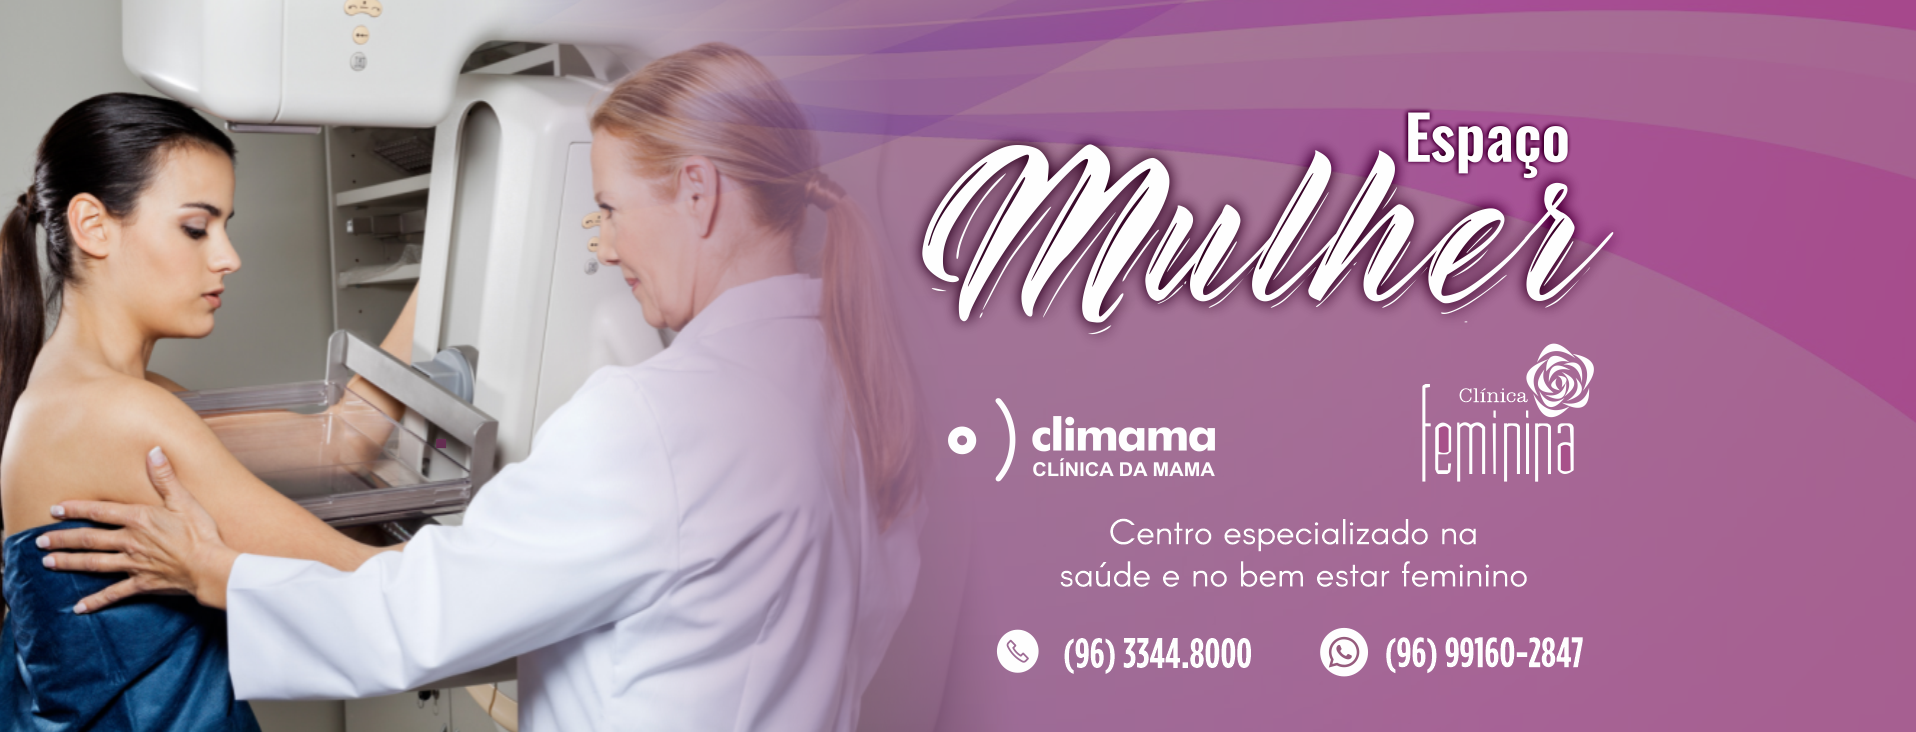 CLIMAMA E FEMININA2